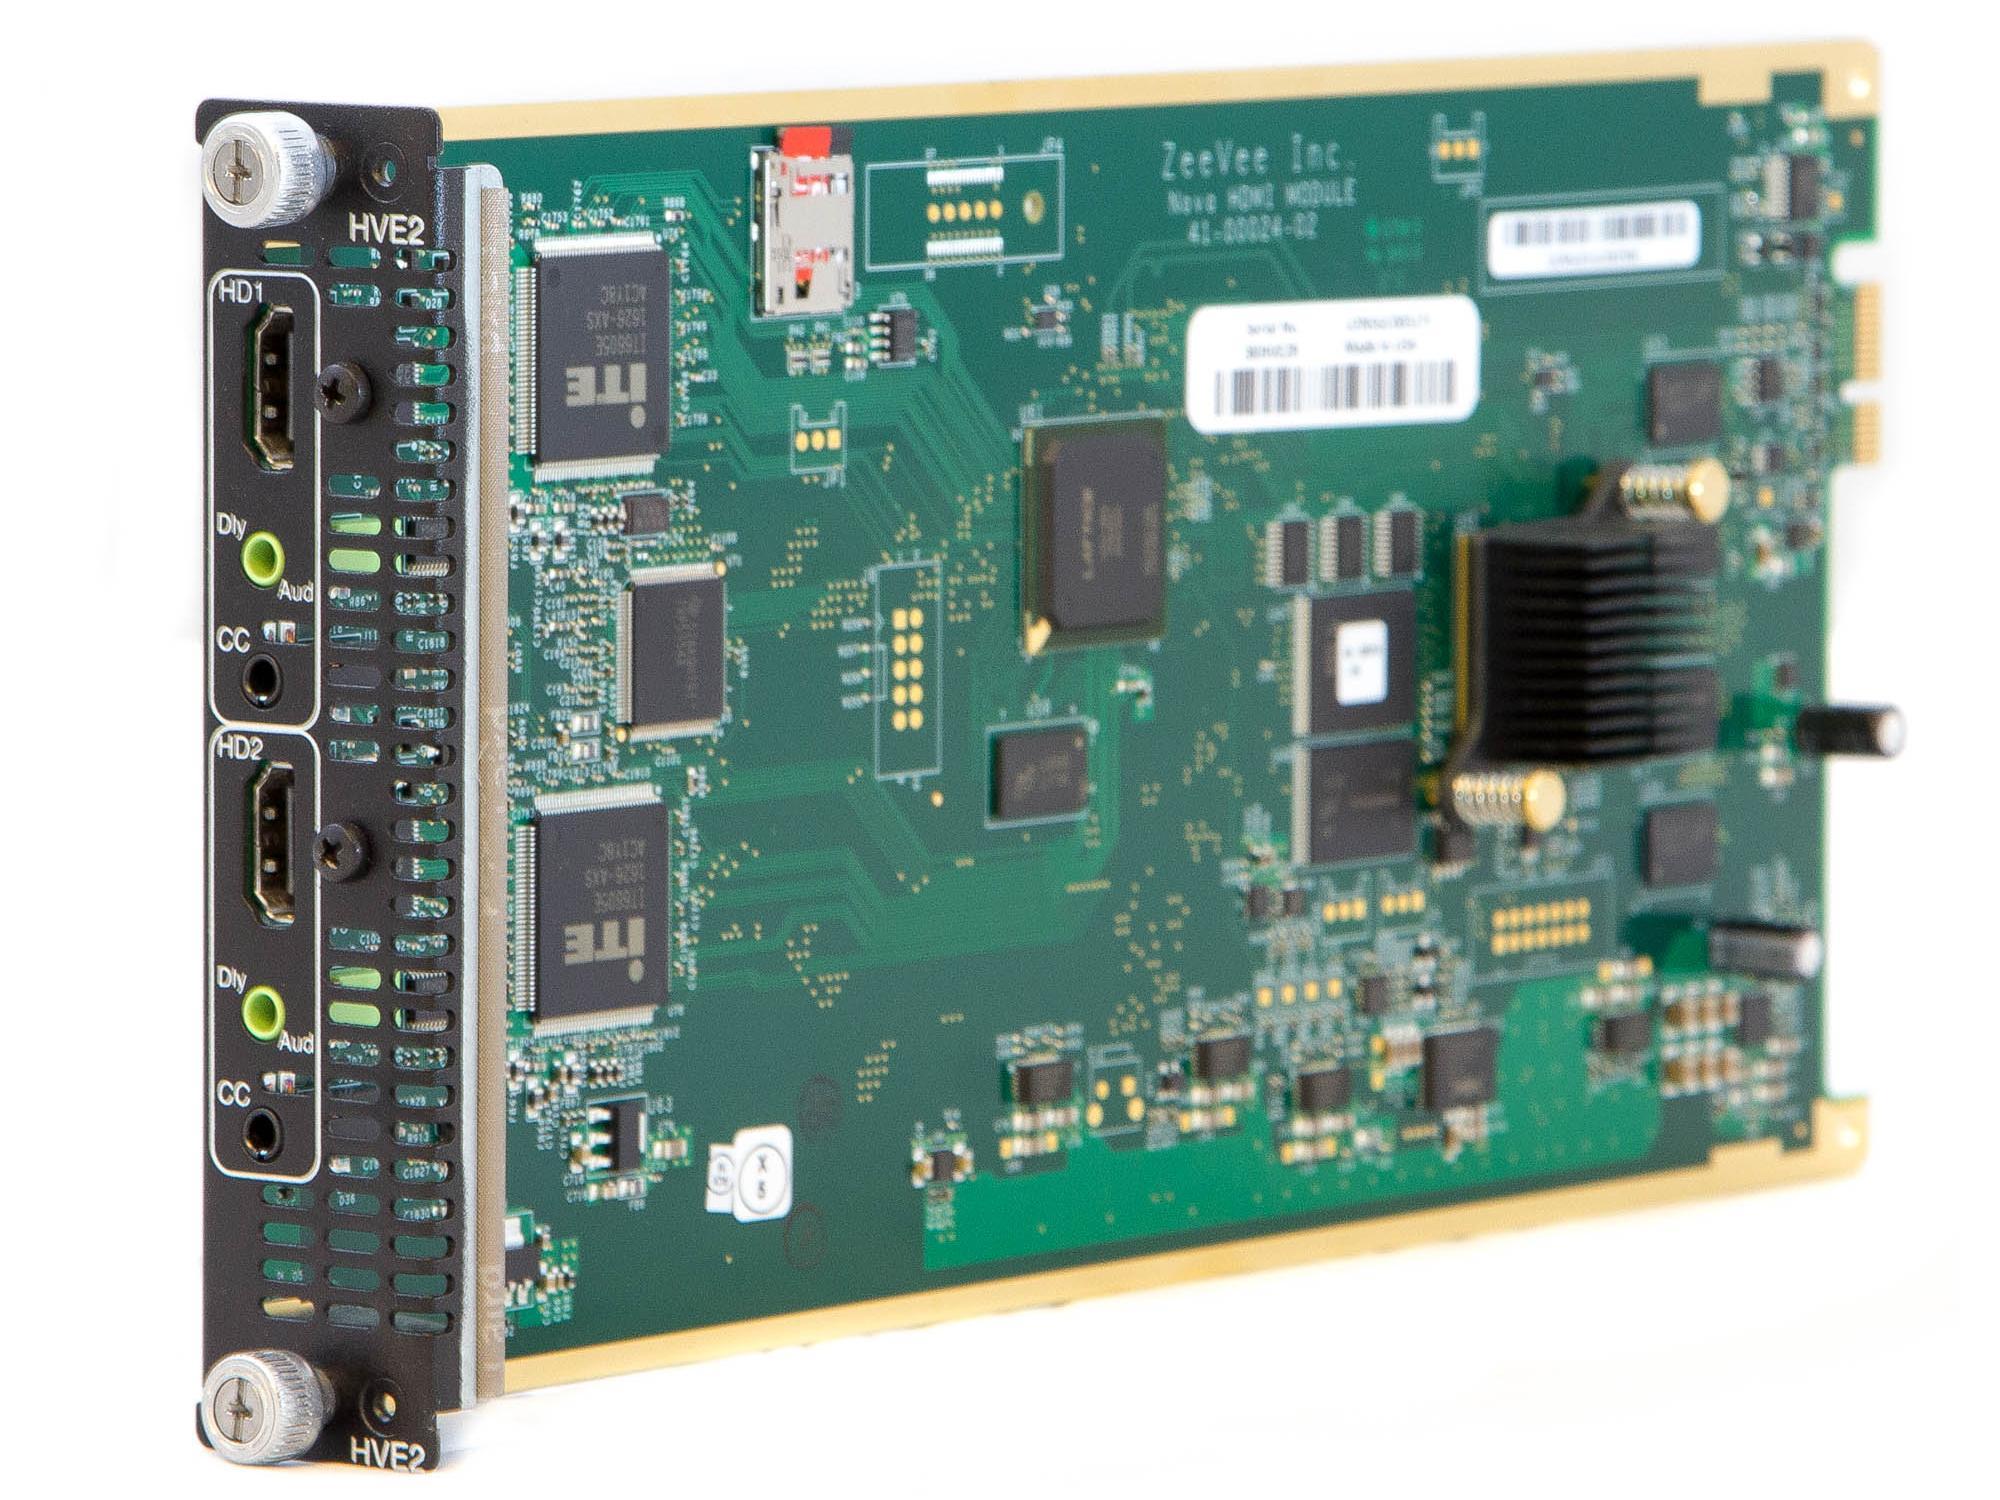 ZeeVee 3KHVE2I Unencrypted HDMI RF/IP Media Module HD video encoder/modulator for HDbridge3000